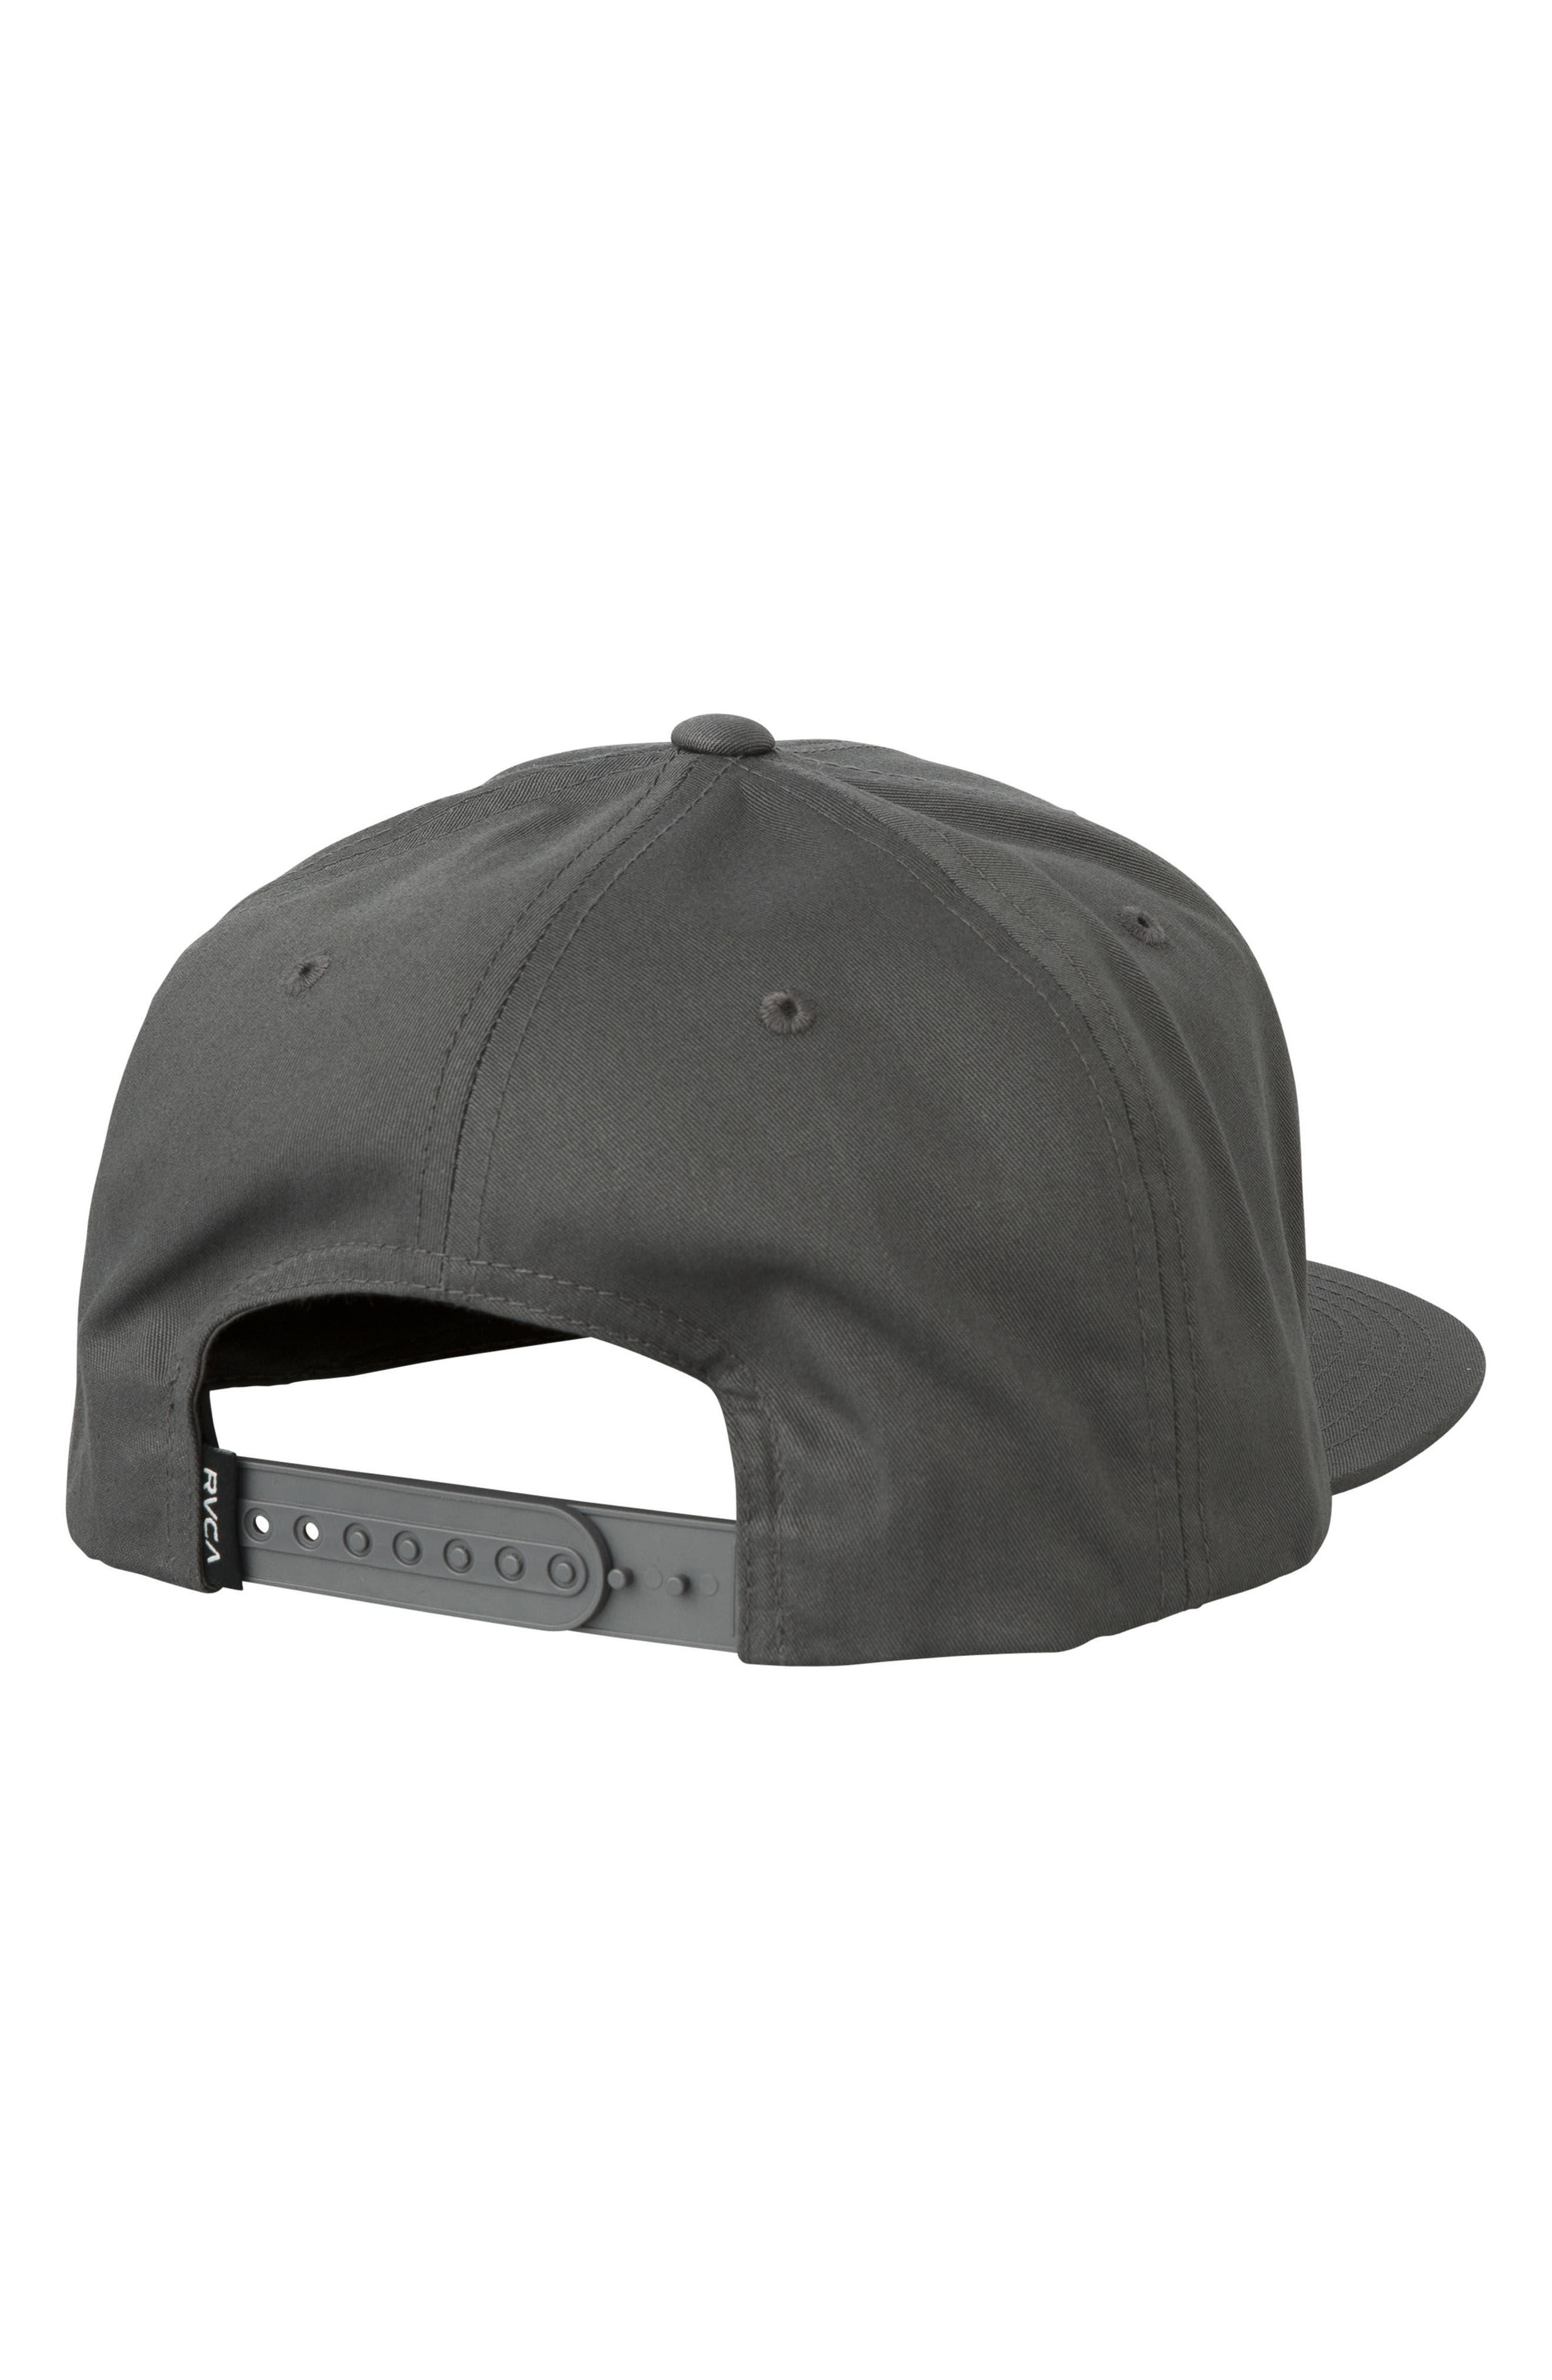 'VA' Snapback Hat,                             Alternate thumbnail 2, color,                             Grey Blue